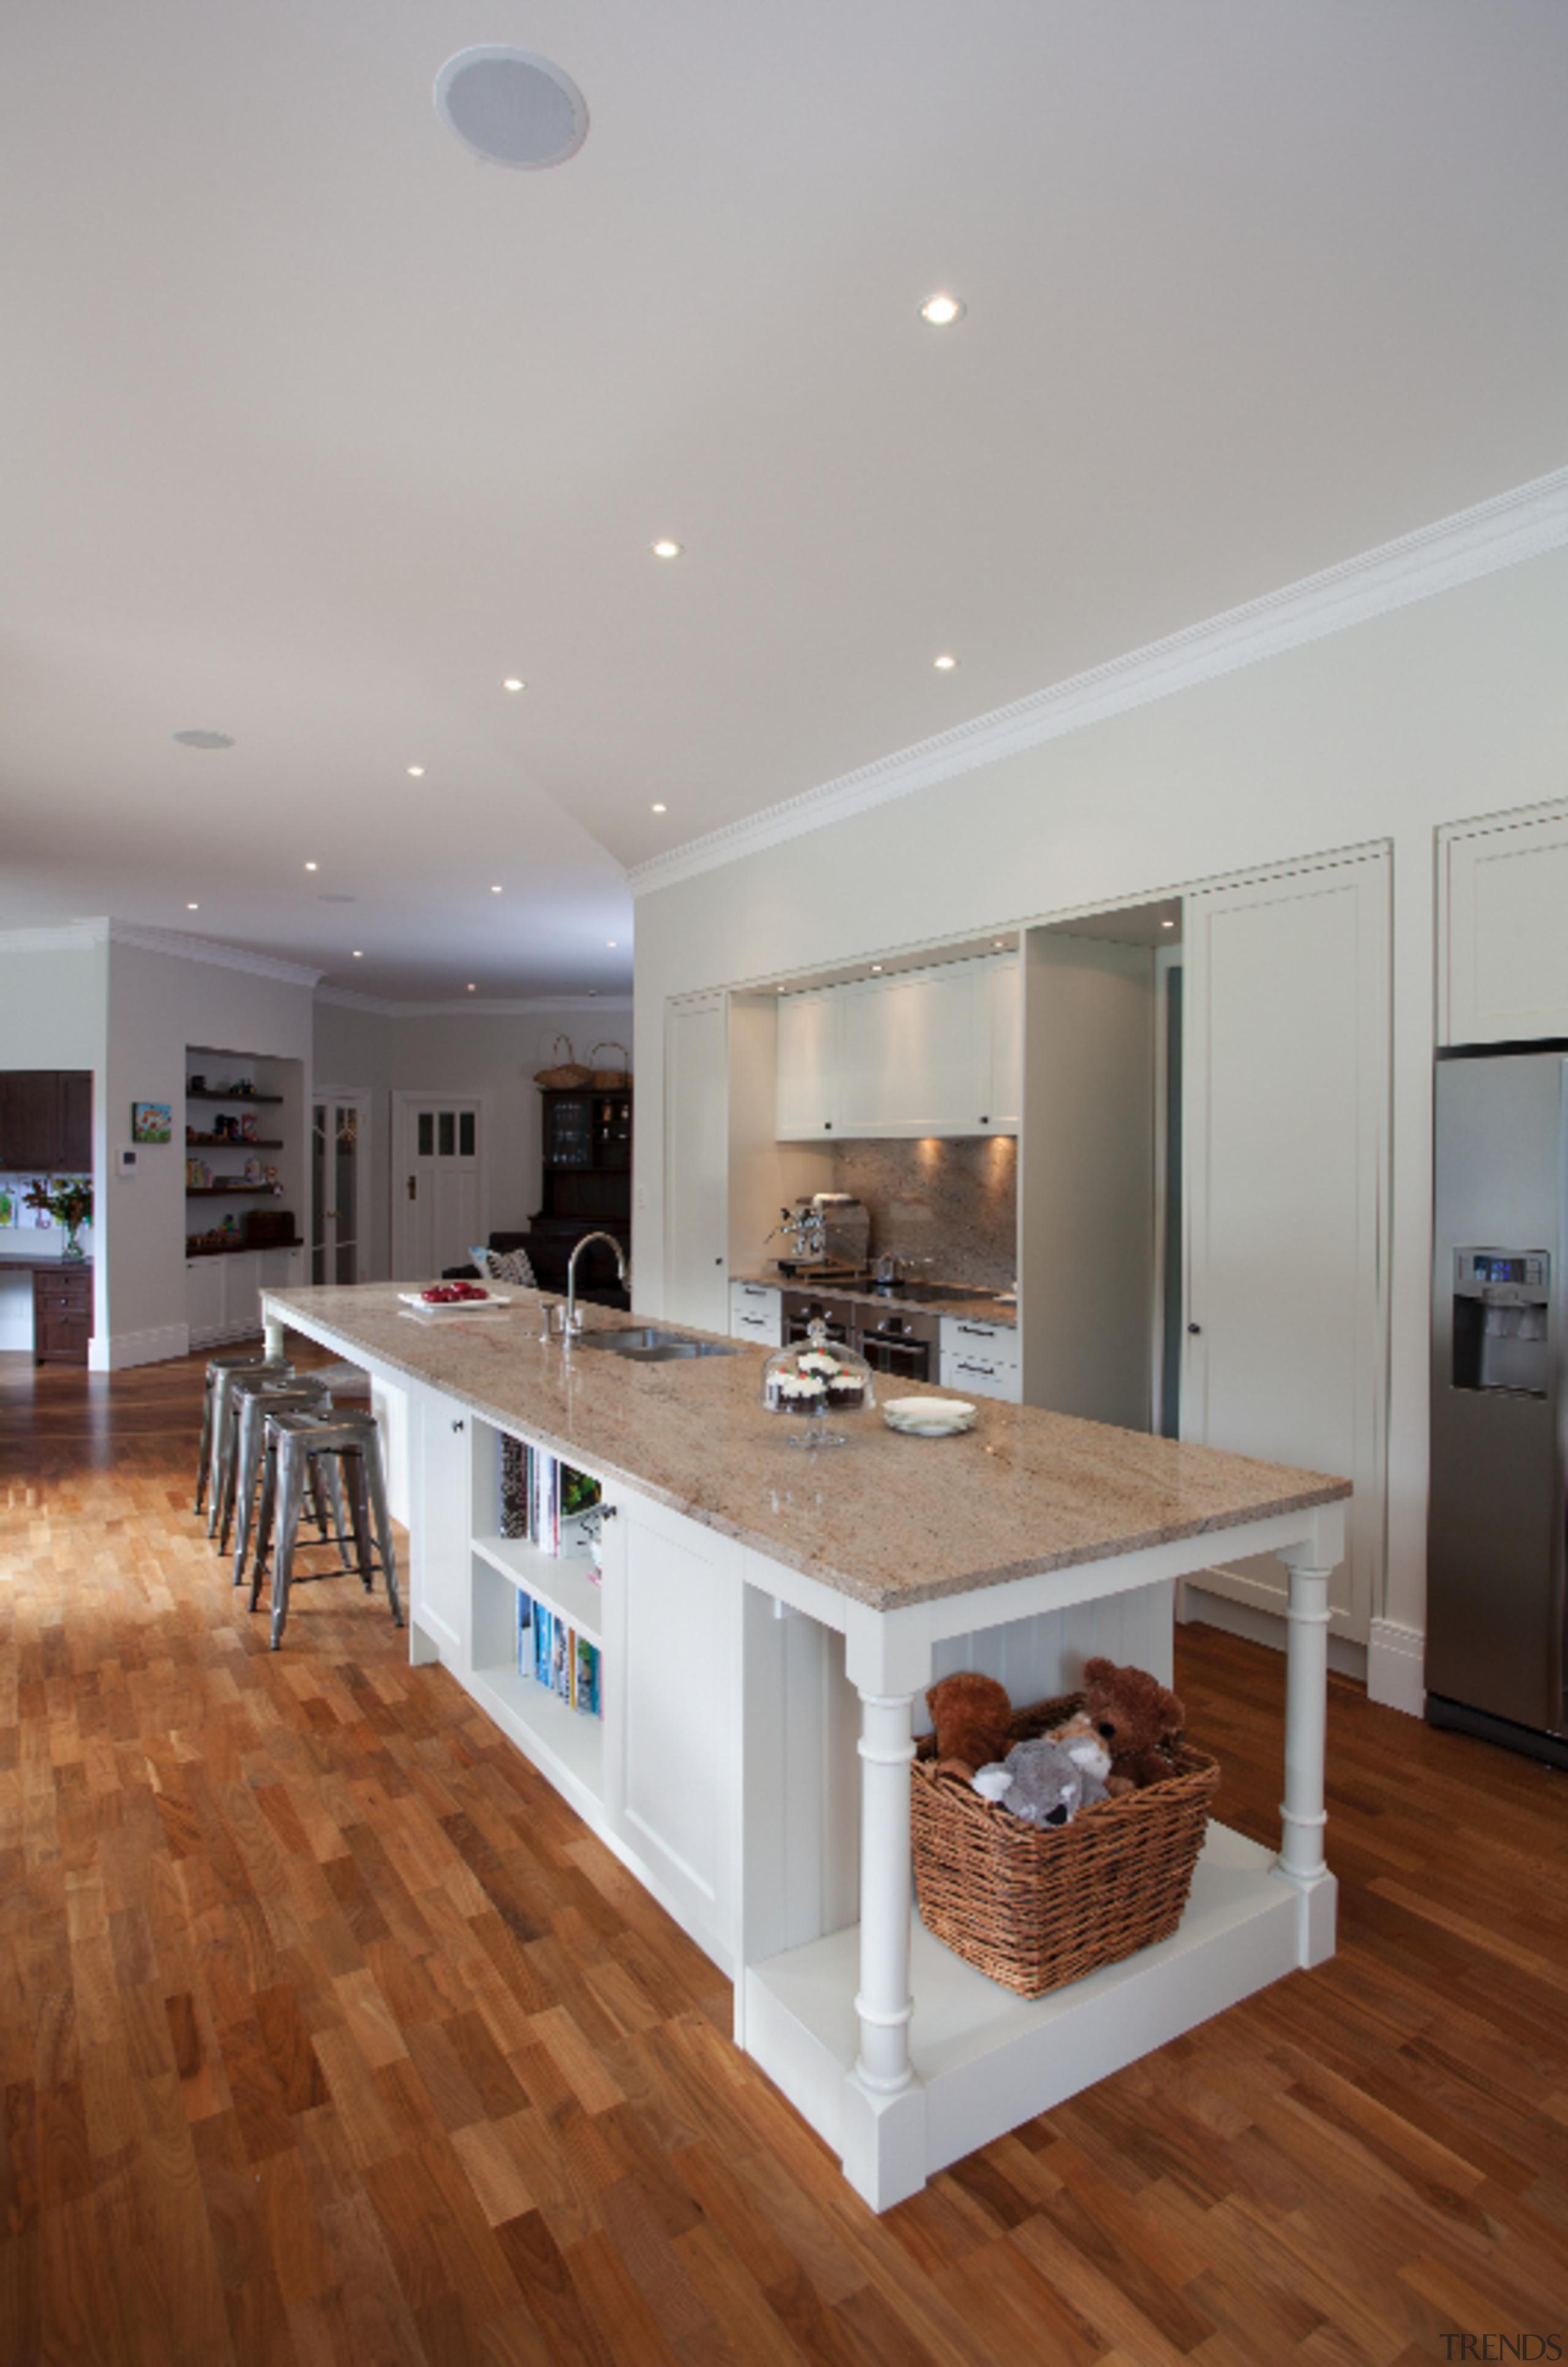 Epsom - ceiling   countertop   floor   ceiling, countertop, floor, flooring, hardwood, interior design, kitchen, laminate flooring, real estate, room, wood flooring, gray, brown